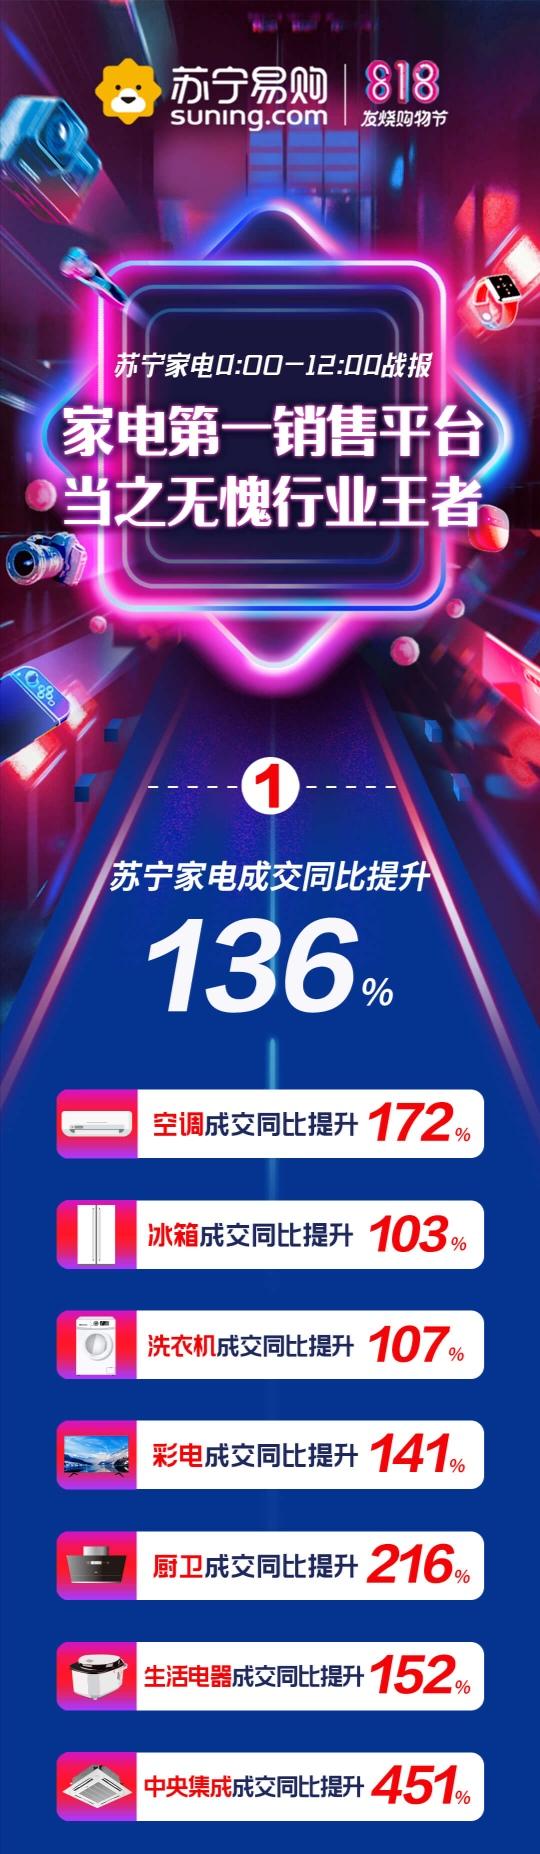 C:\Users\14051171\AppData\Local\Temp\WeChat Files\406124c6041bd828cbb845b1339c71b.jpg